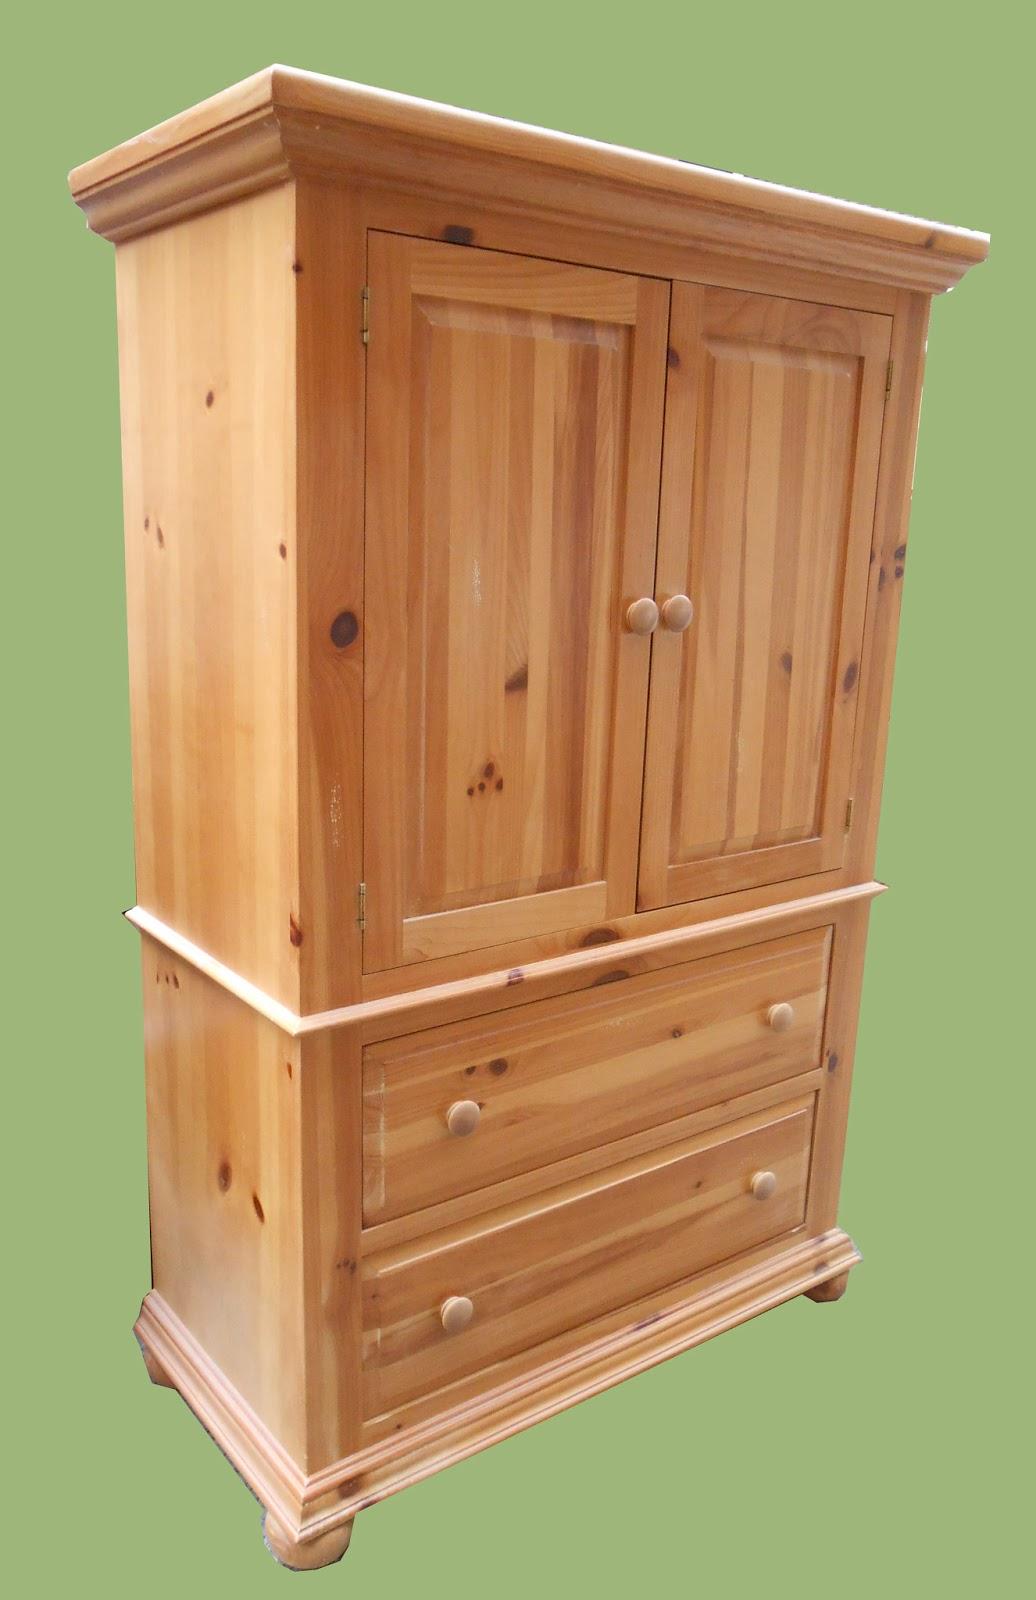 Broyhill Fontana Furniture : broyhill, fontana, furniture, Uhuru, Furniture, Collectibles:, Broyhill, 'Fontana', Armoire-SOLD